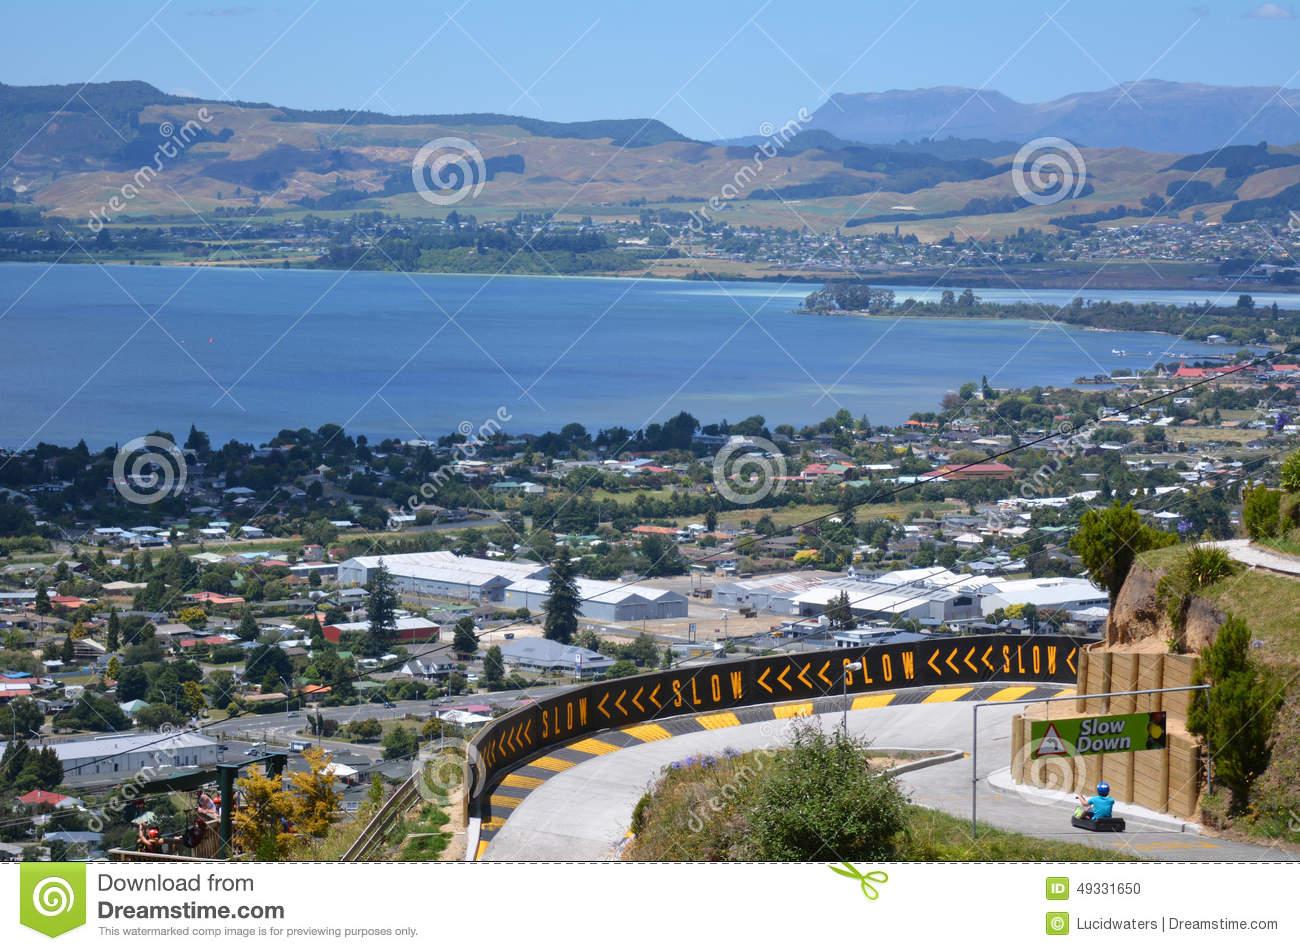 Skyline Rotorua Luge In Rotorua City.